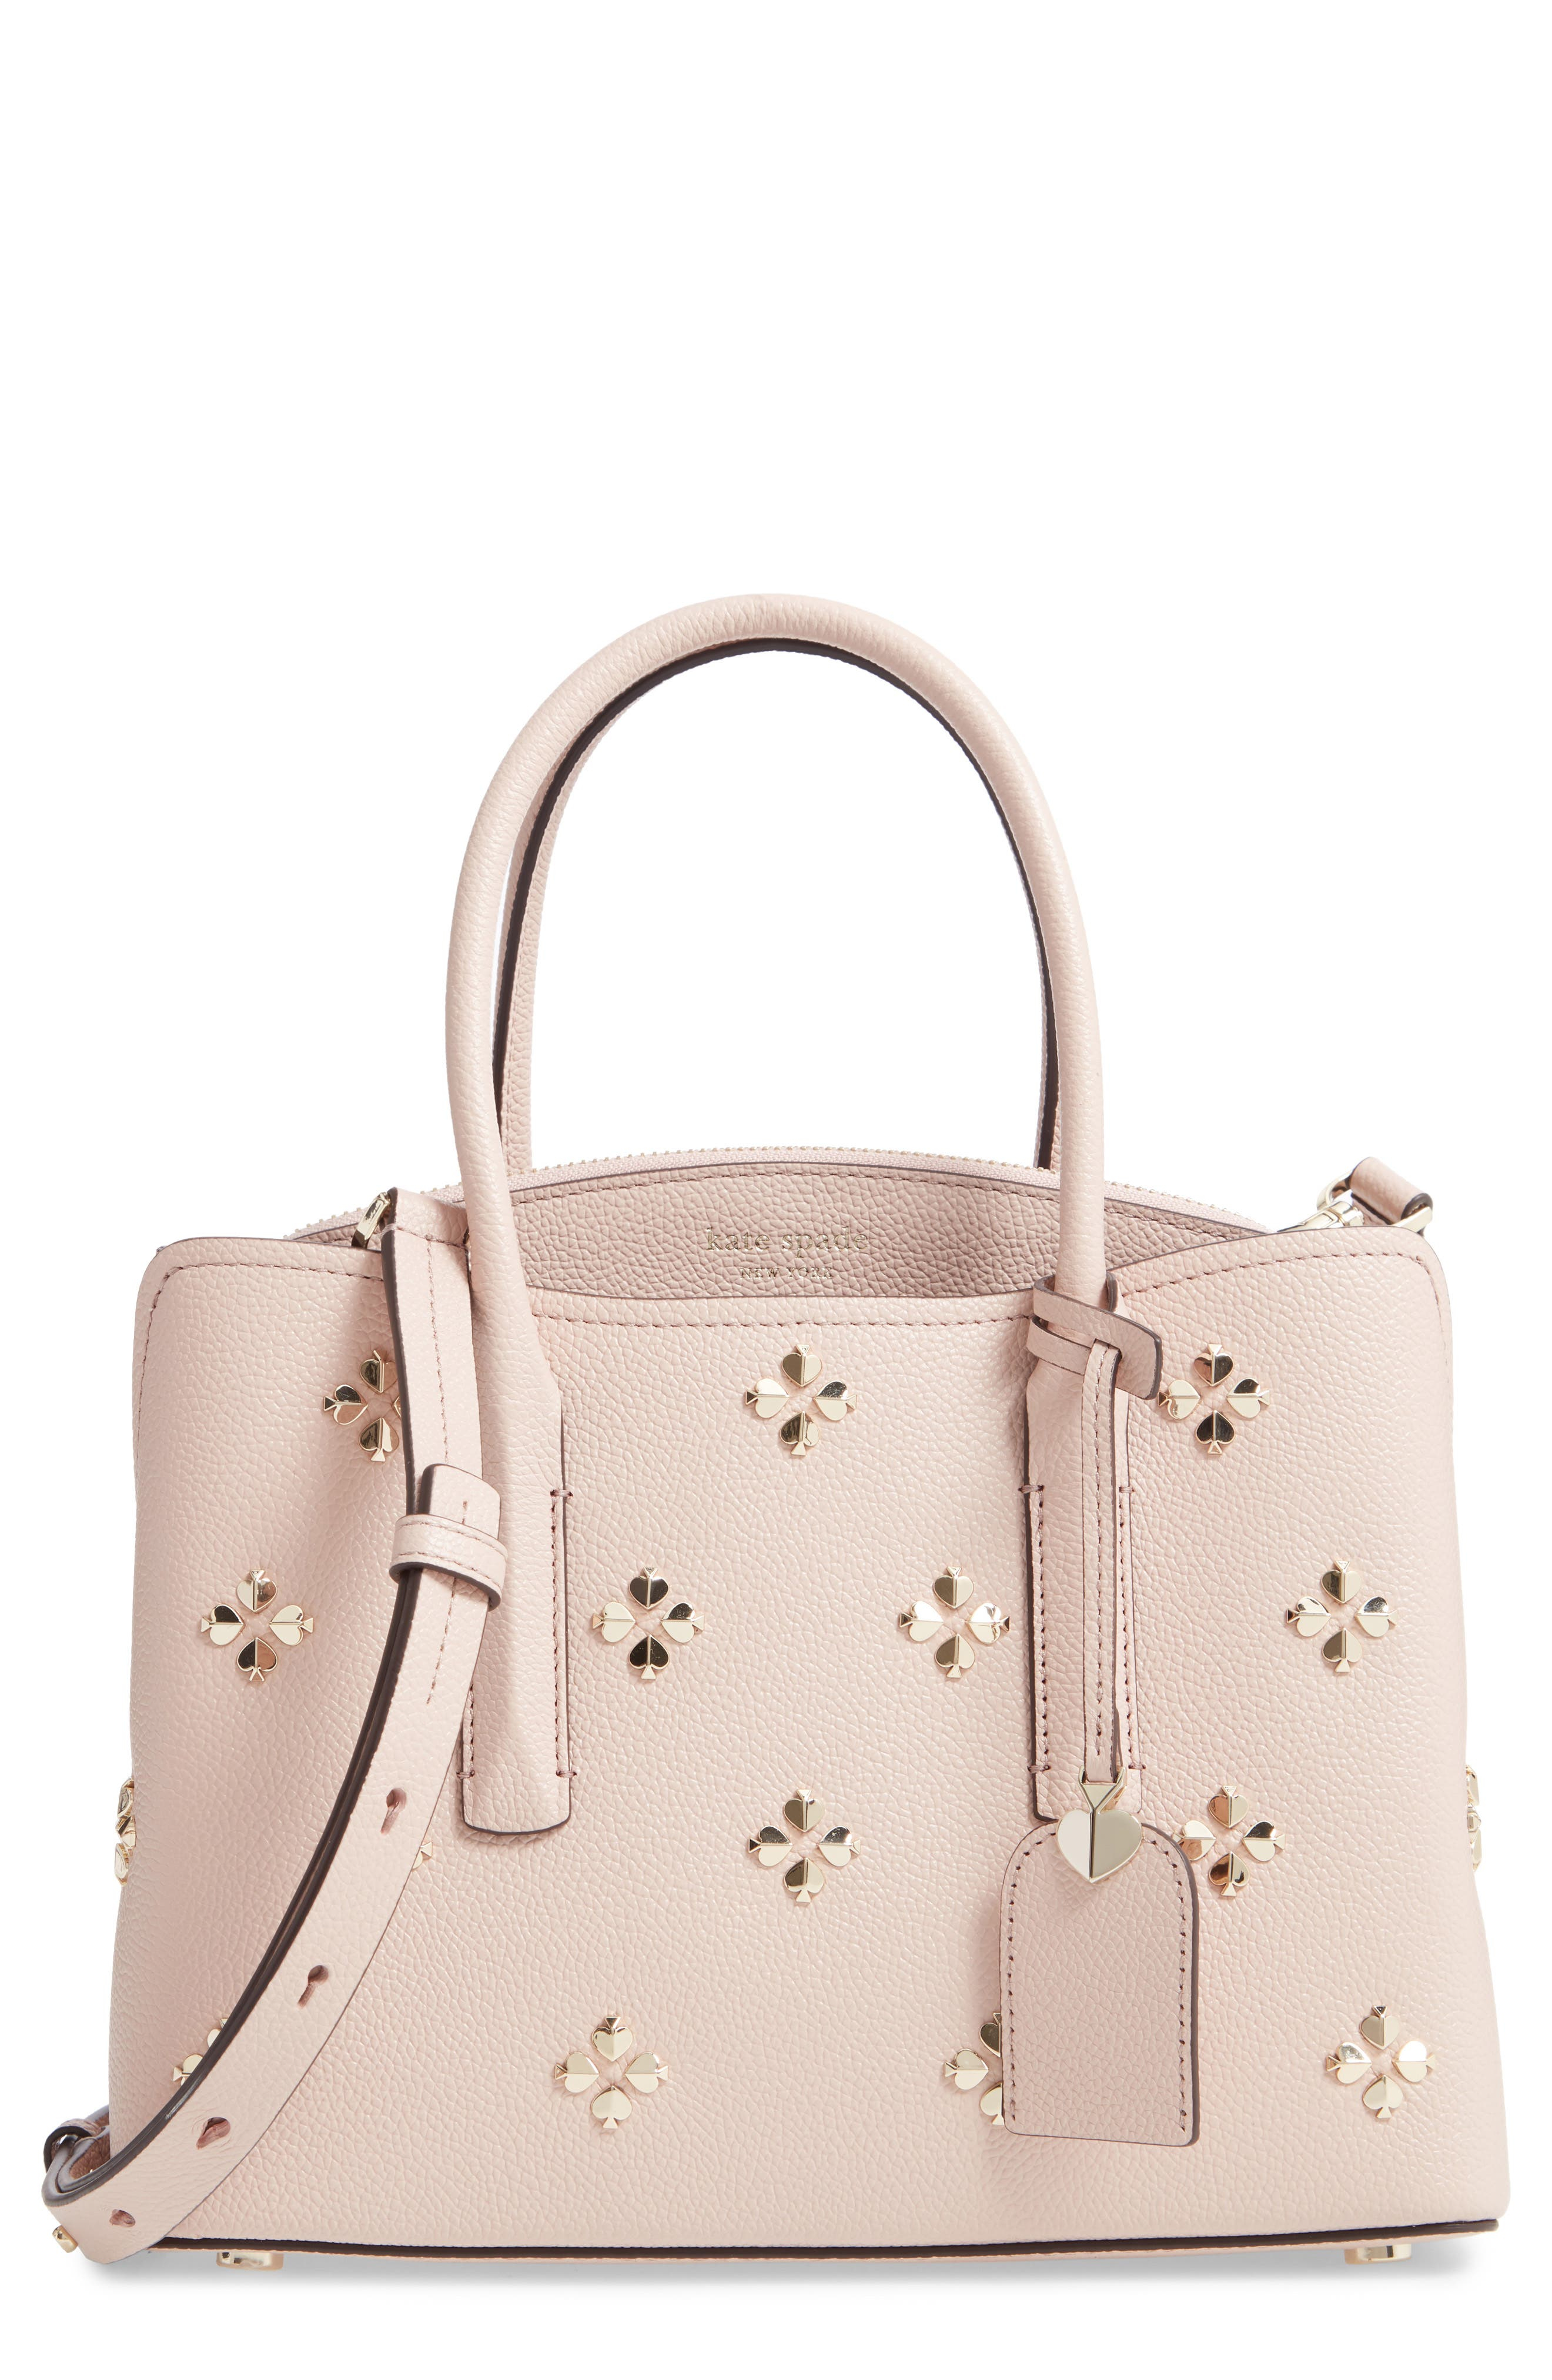 KATE SPADE NEW YORK medium margaux embellished leather satchel, Main, color, PALE VELLUM